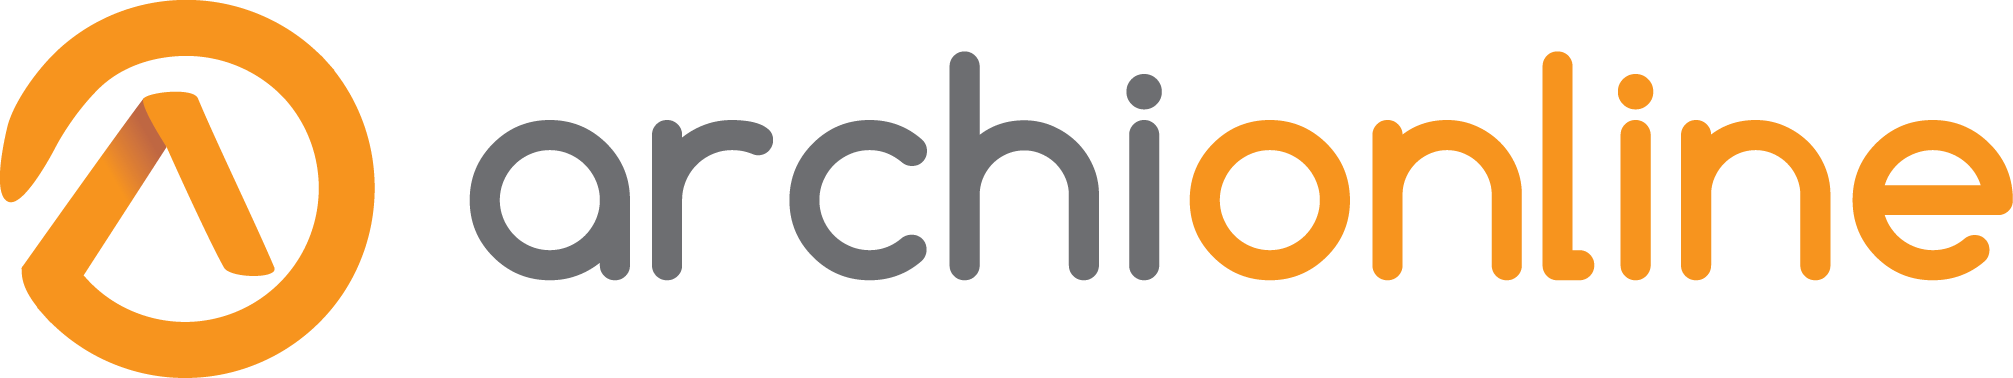 logo_Archionline